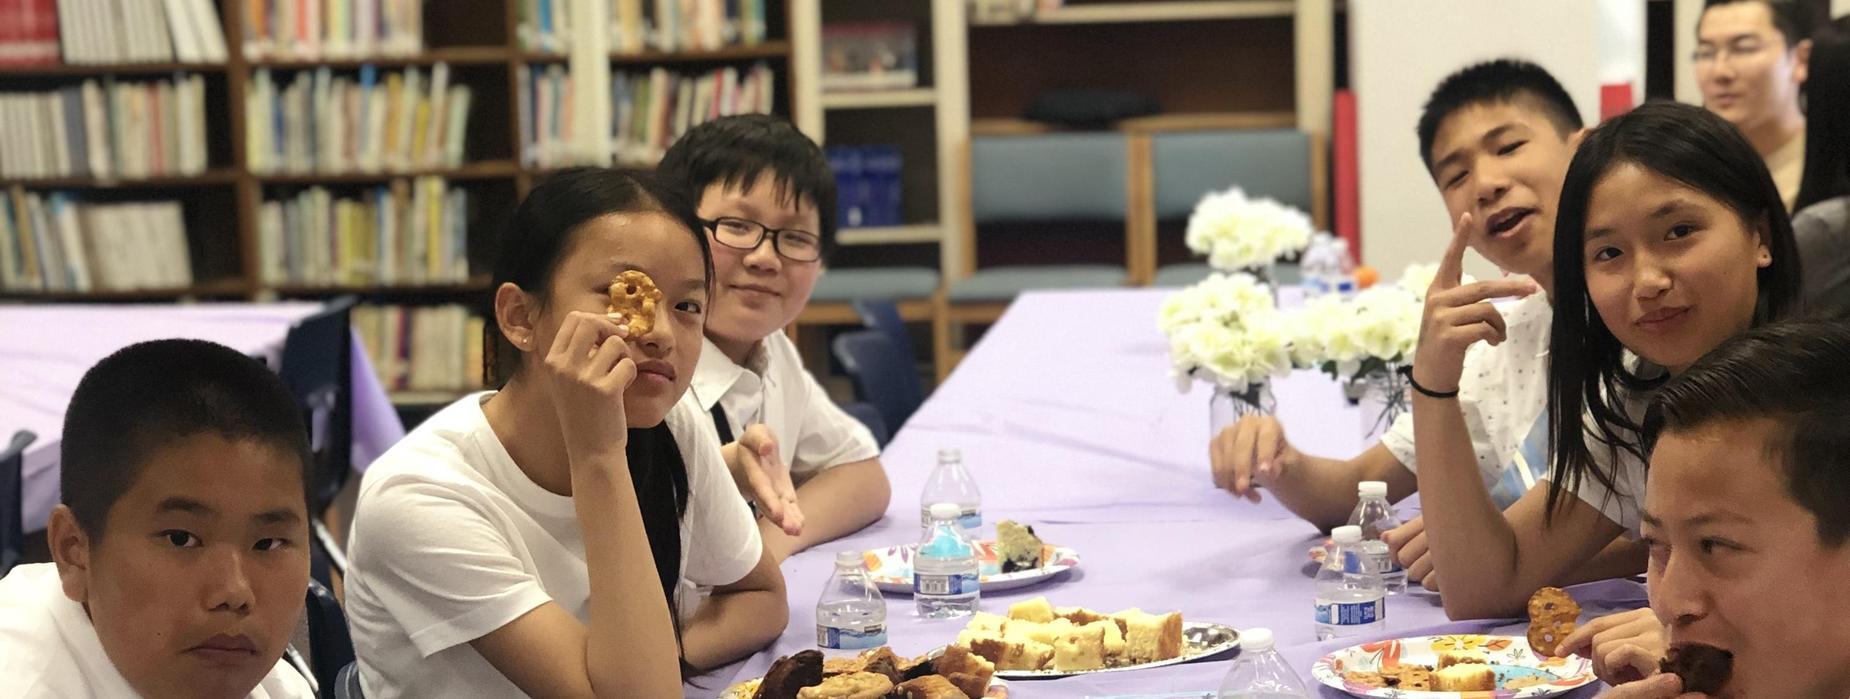 Marguerita student volunteer having lunch